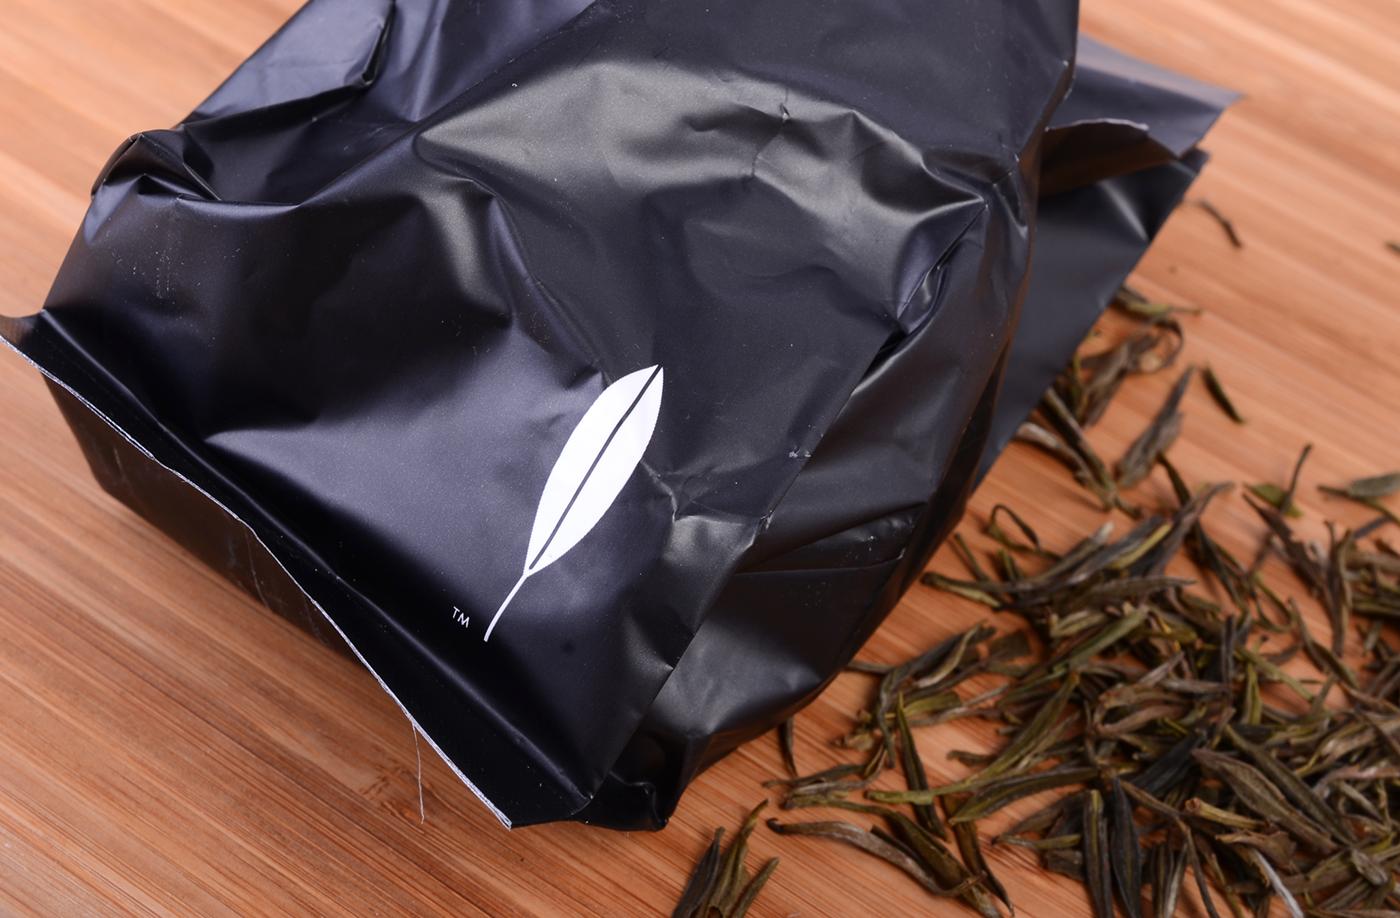 tea konrad Sybilski identity chinese tin box leaf sharing black drink metal china Minimalism paper